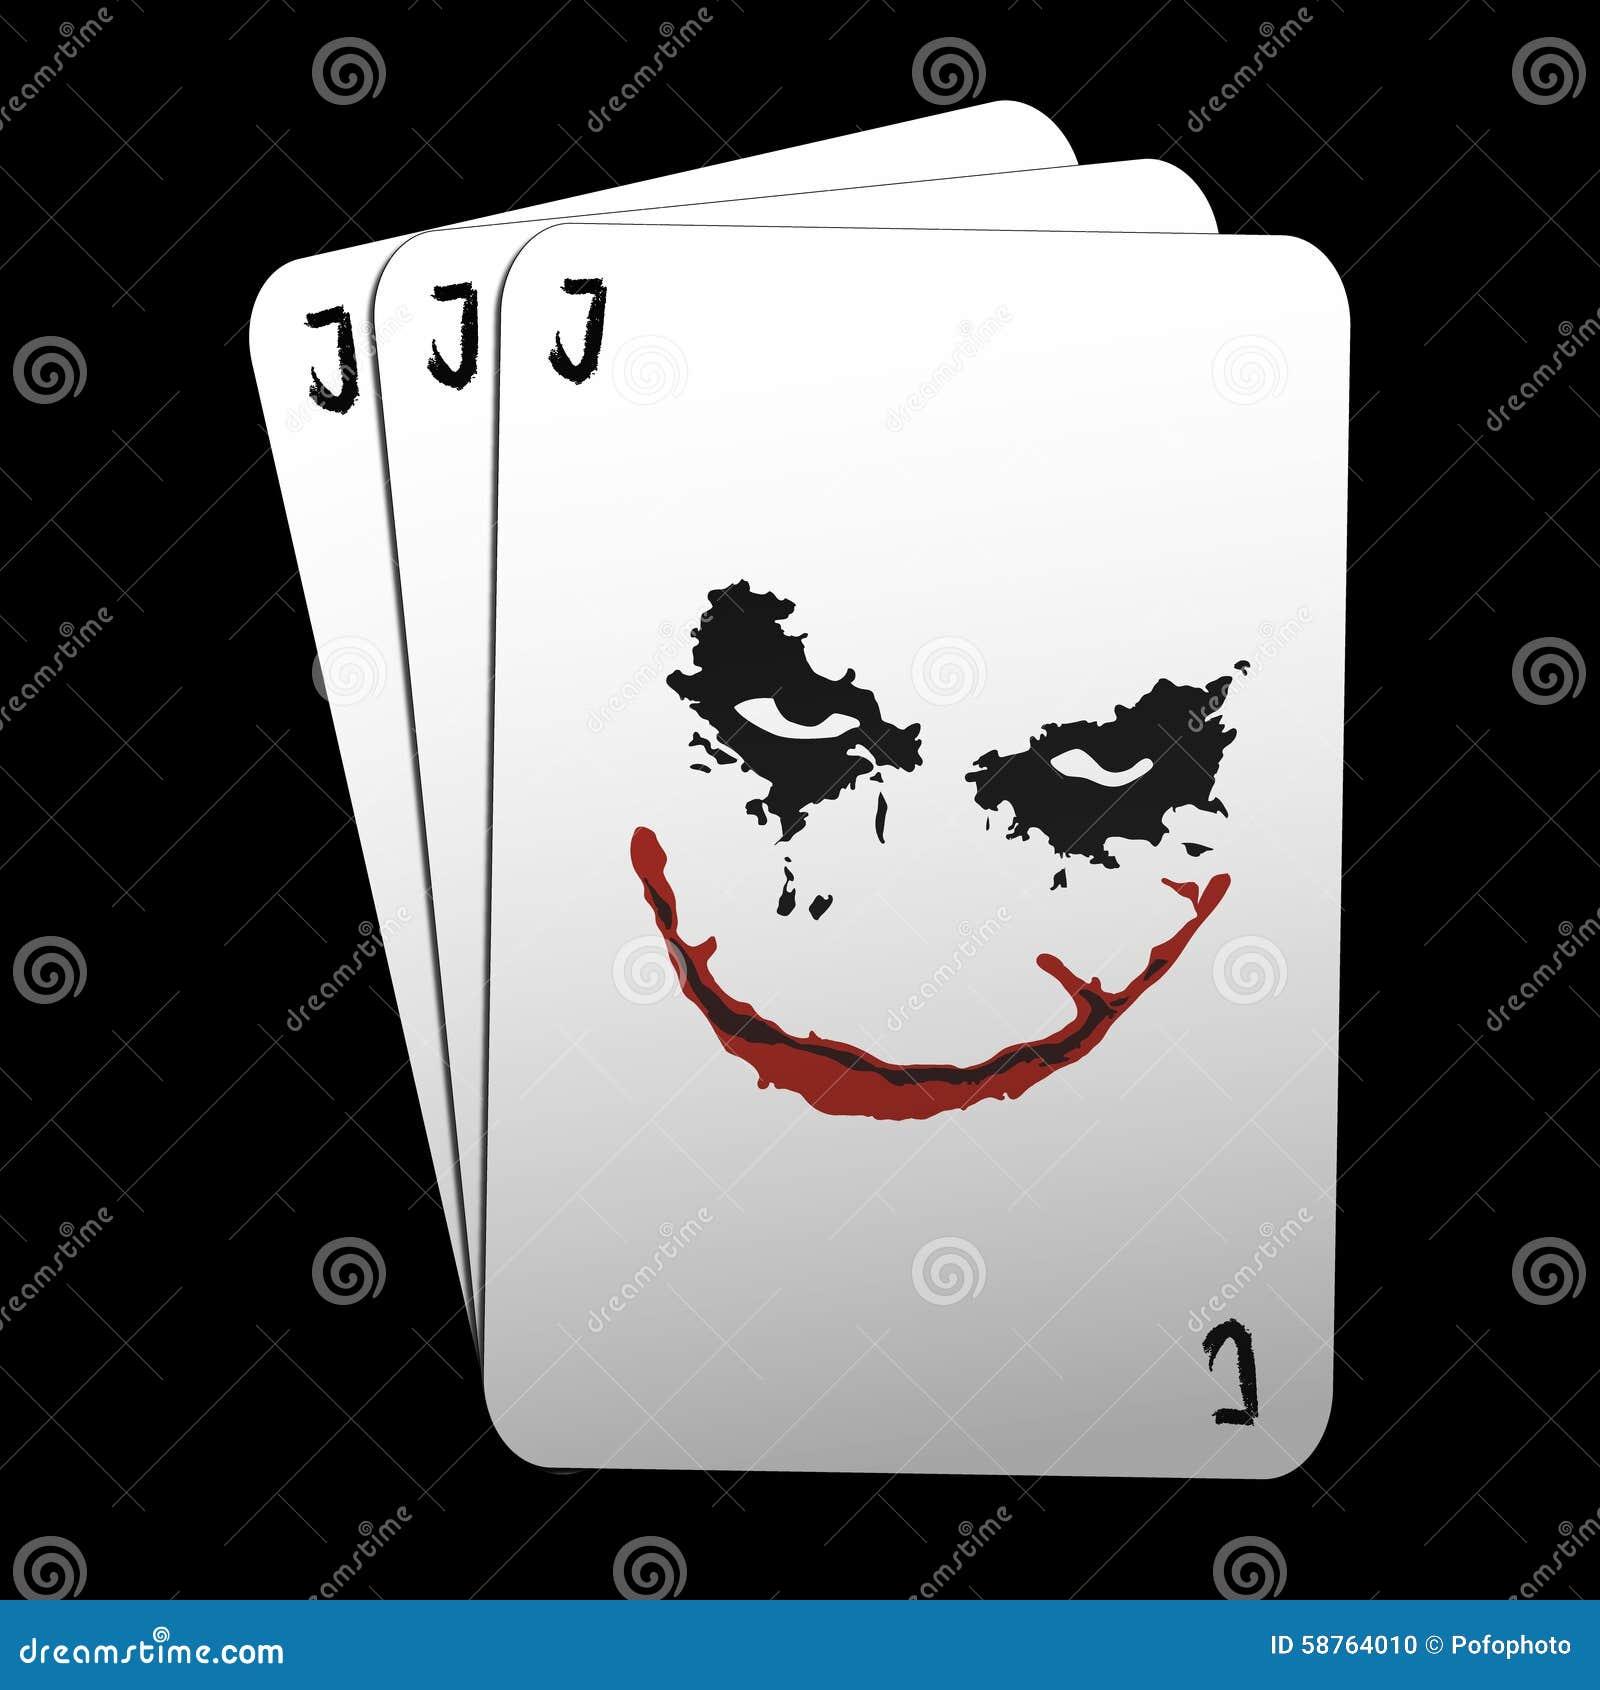 joker card mastercard